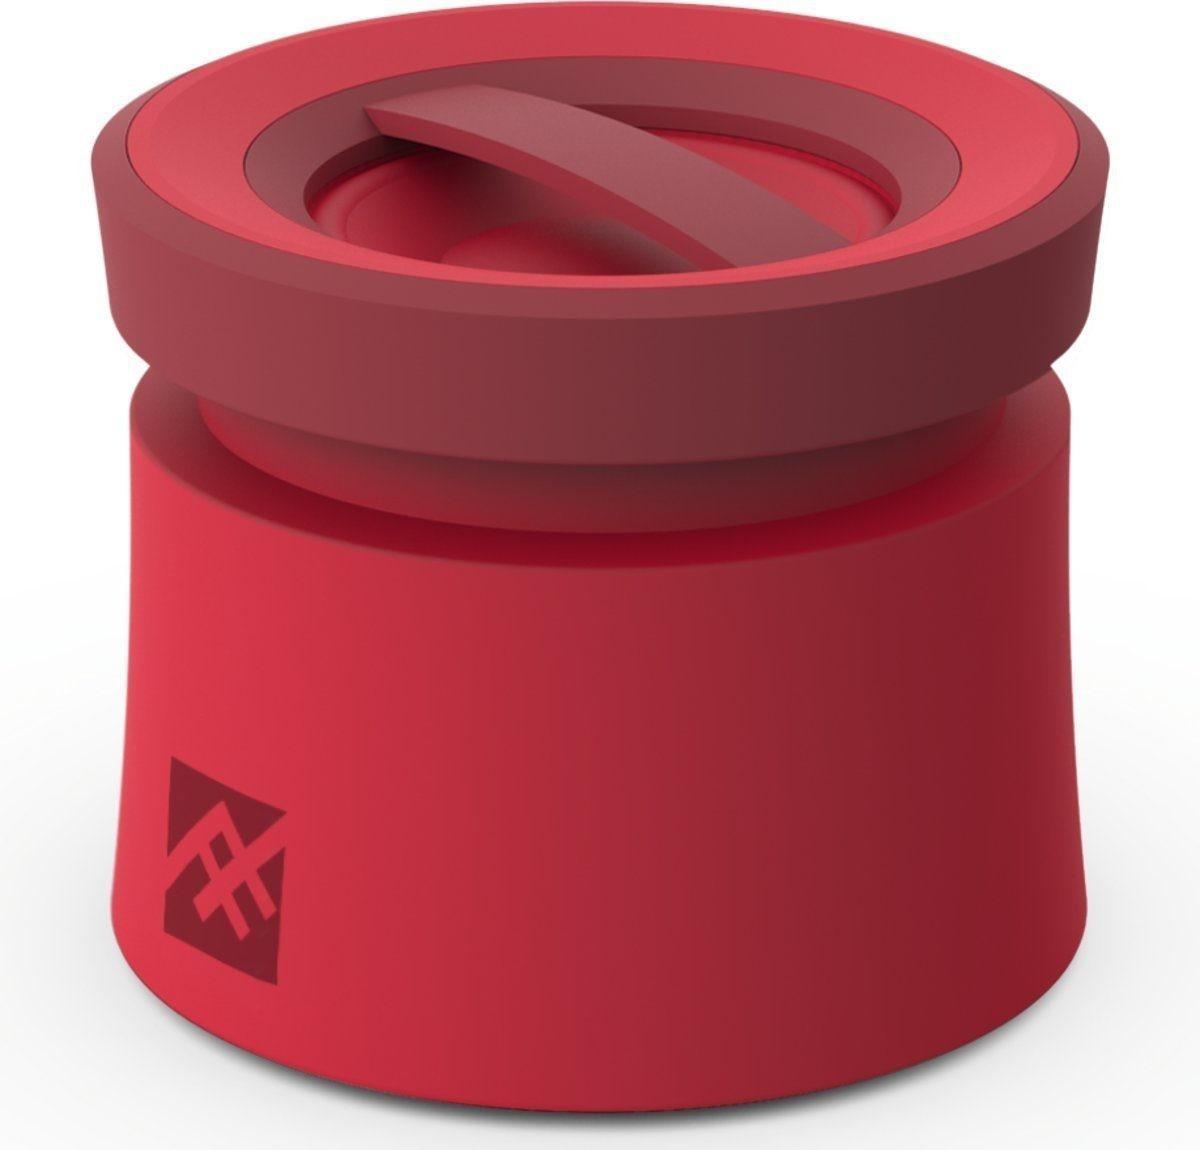 Image of ifrogz coda wireless Bluetooth Speaker